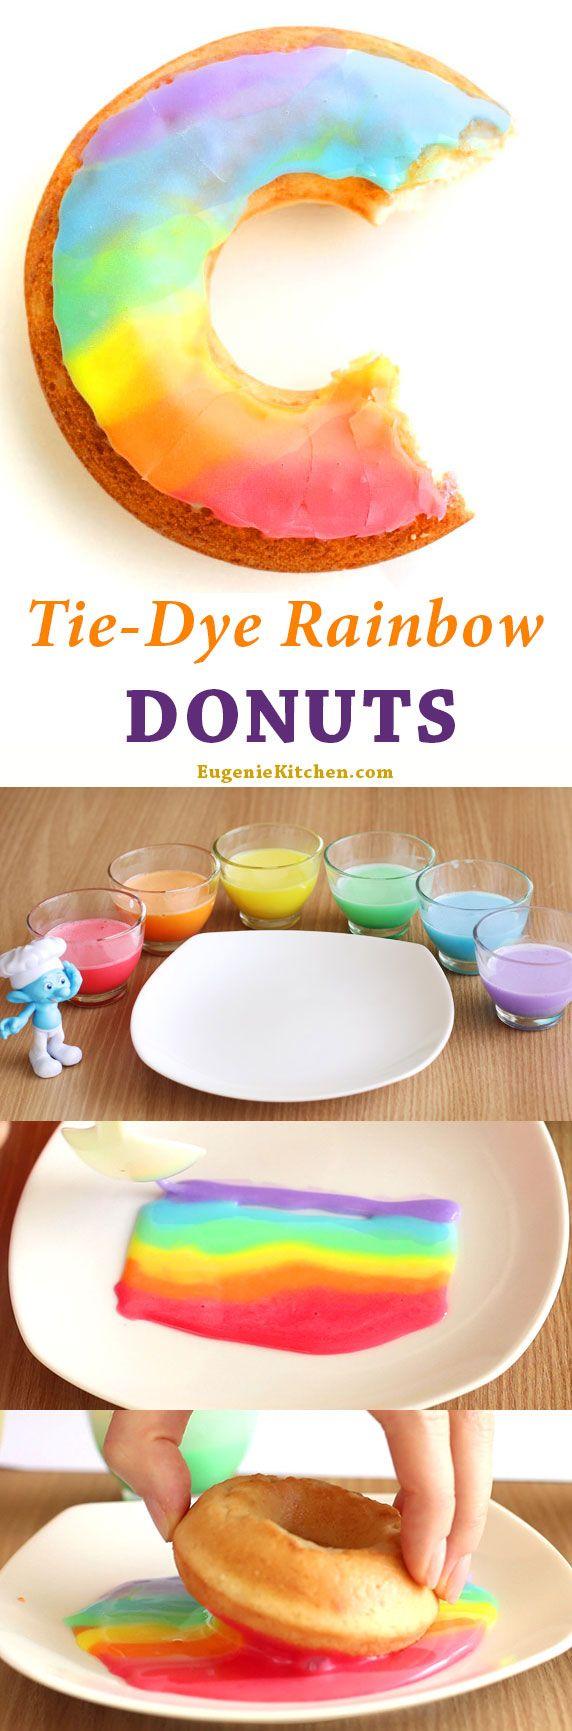 Tie-Dye Rainbow Donuts will make perfect happy snack. Yum!